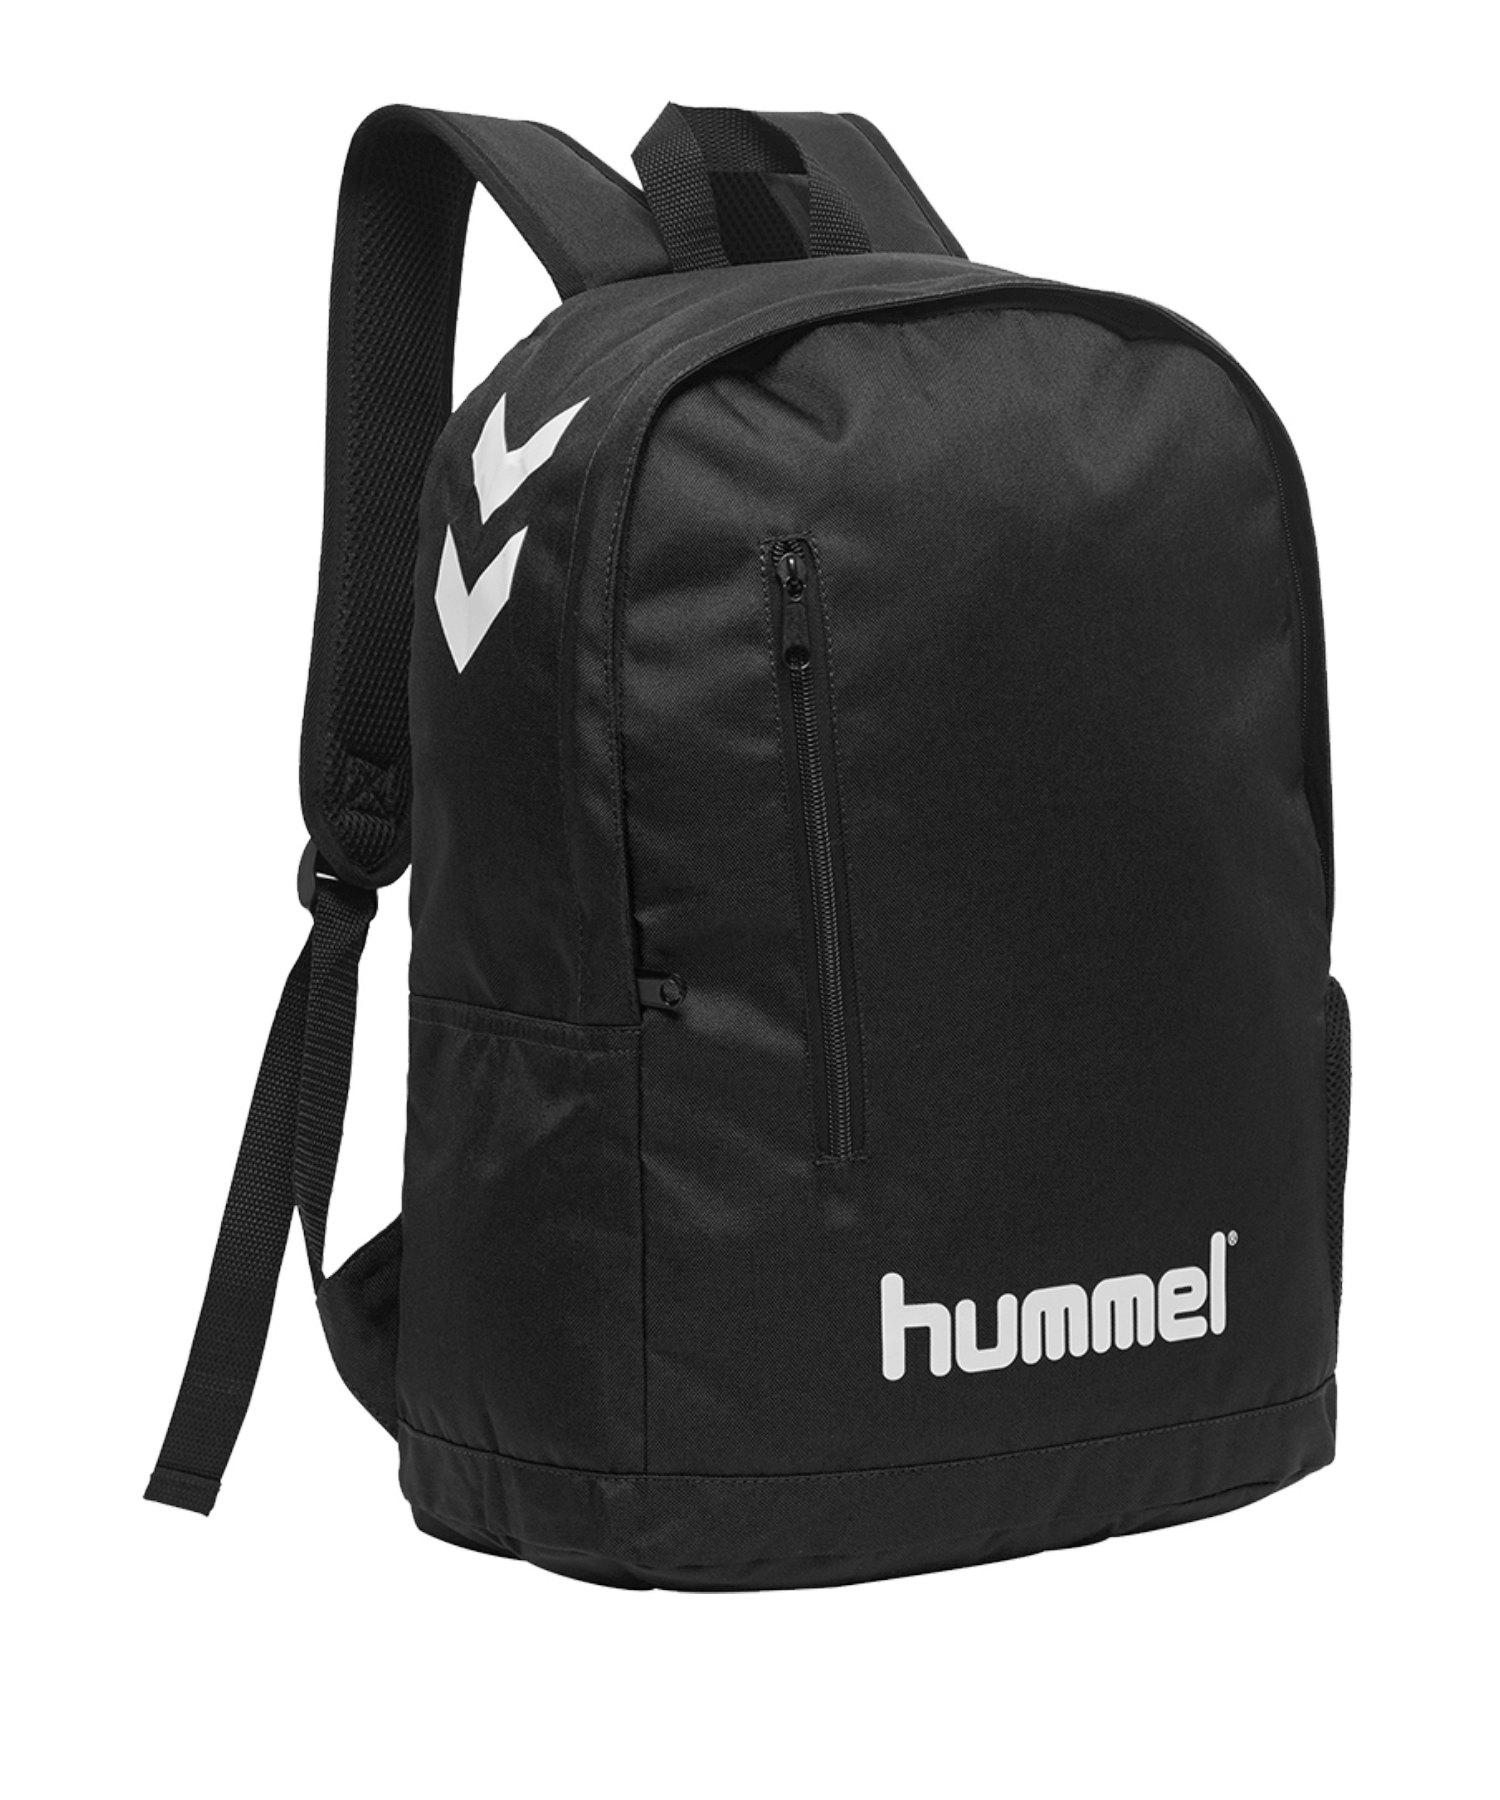 Hummel Core Back Pack Rucksack Schwarz F2001 - schwarz